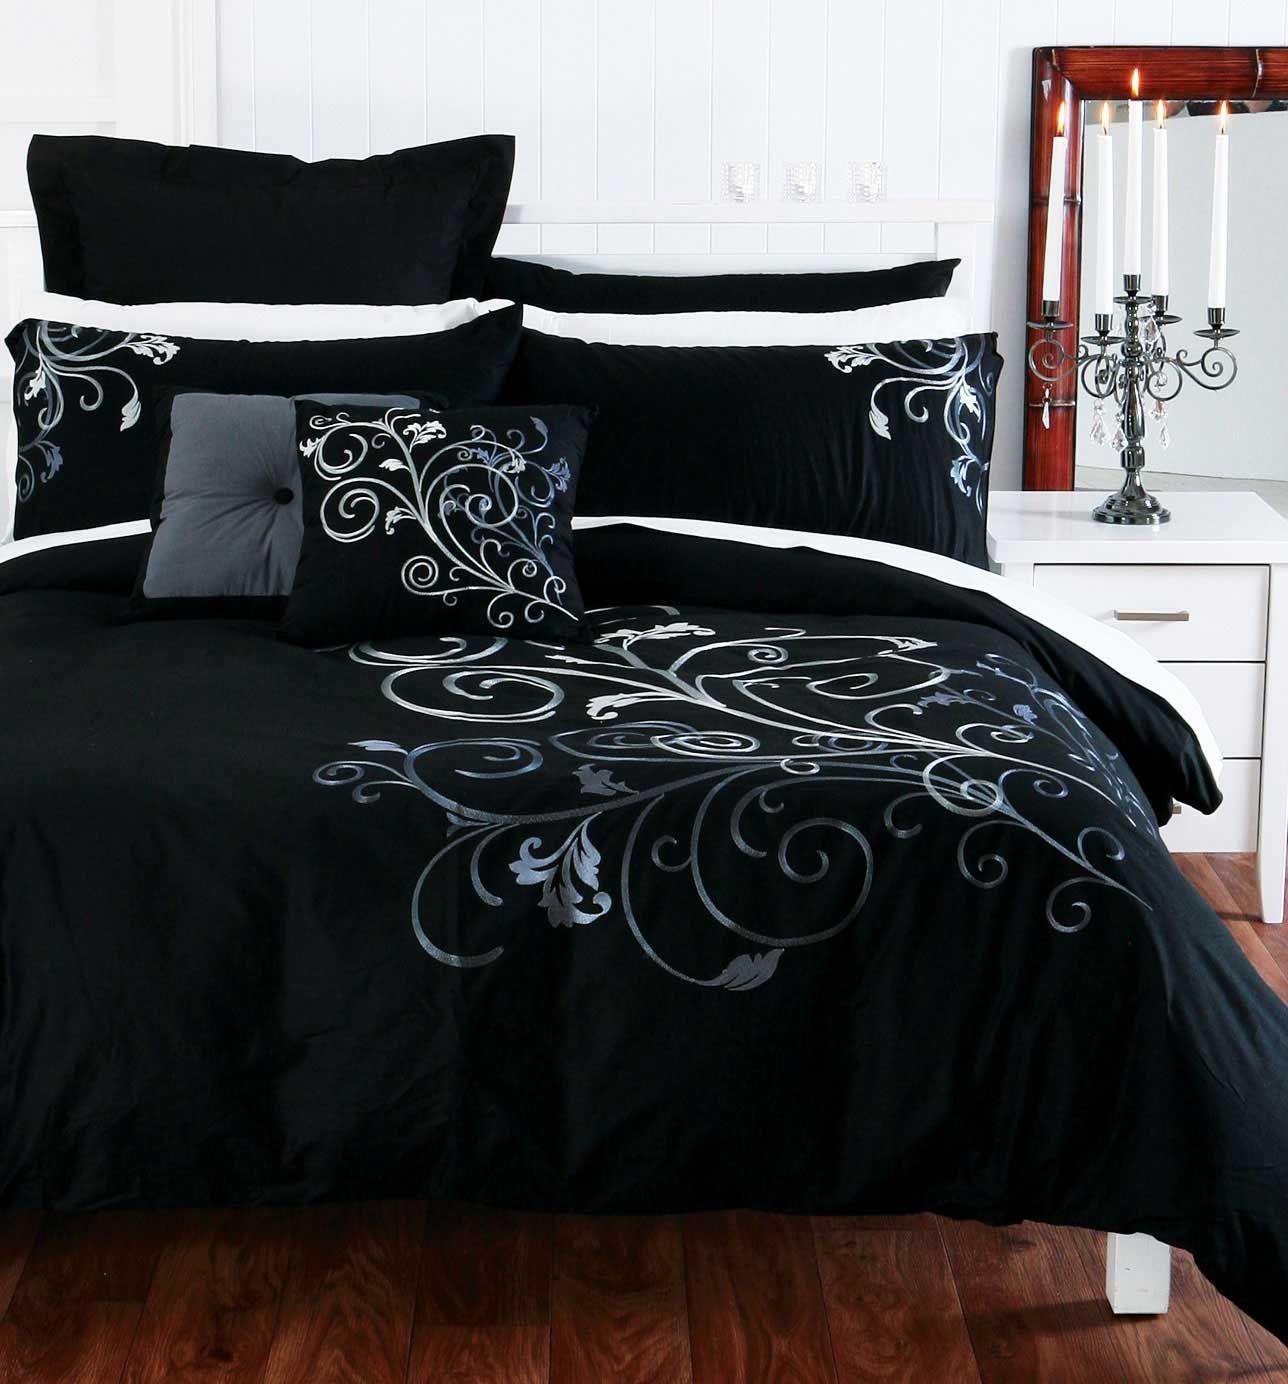 Pillow Talk - San Marco Regal Quilt Cover Pack